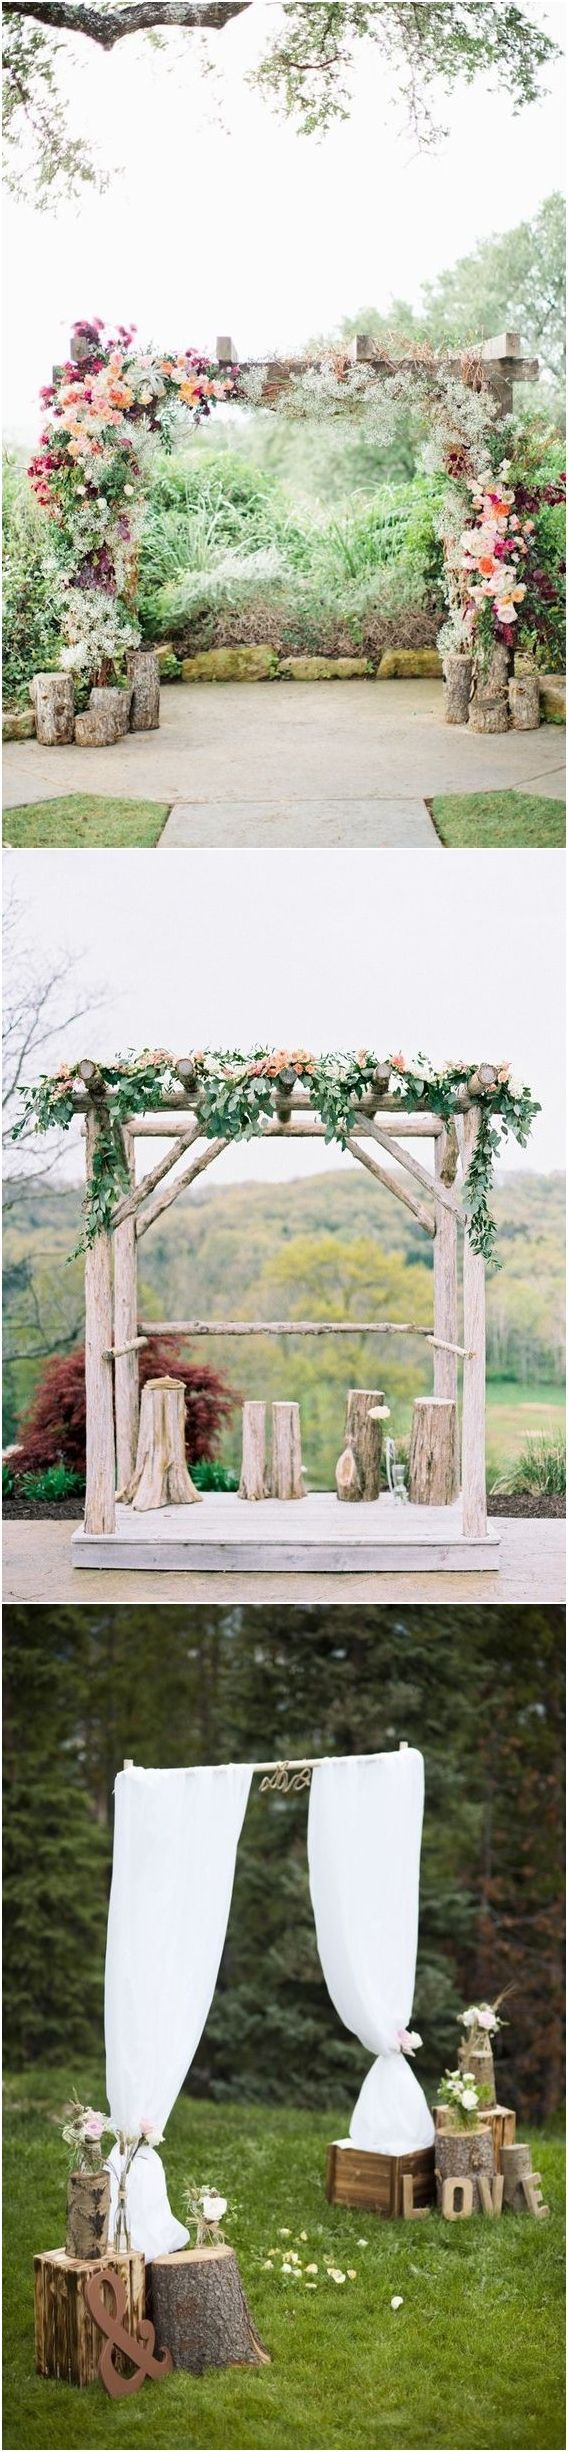 5027 best wedding ideas images on Pinterest   2017 wedding, Bodas ...